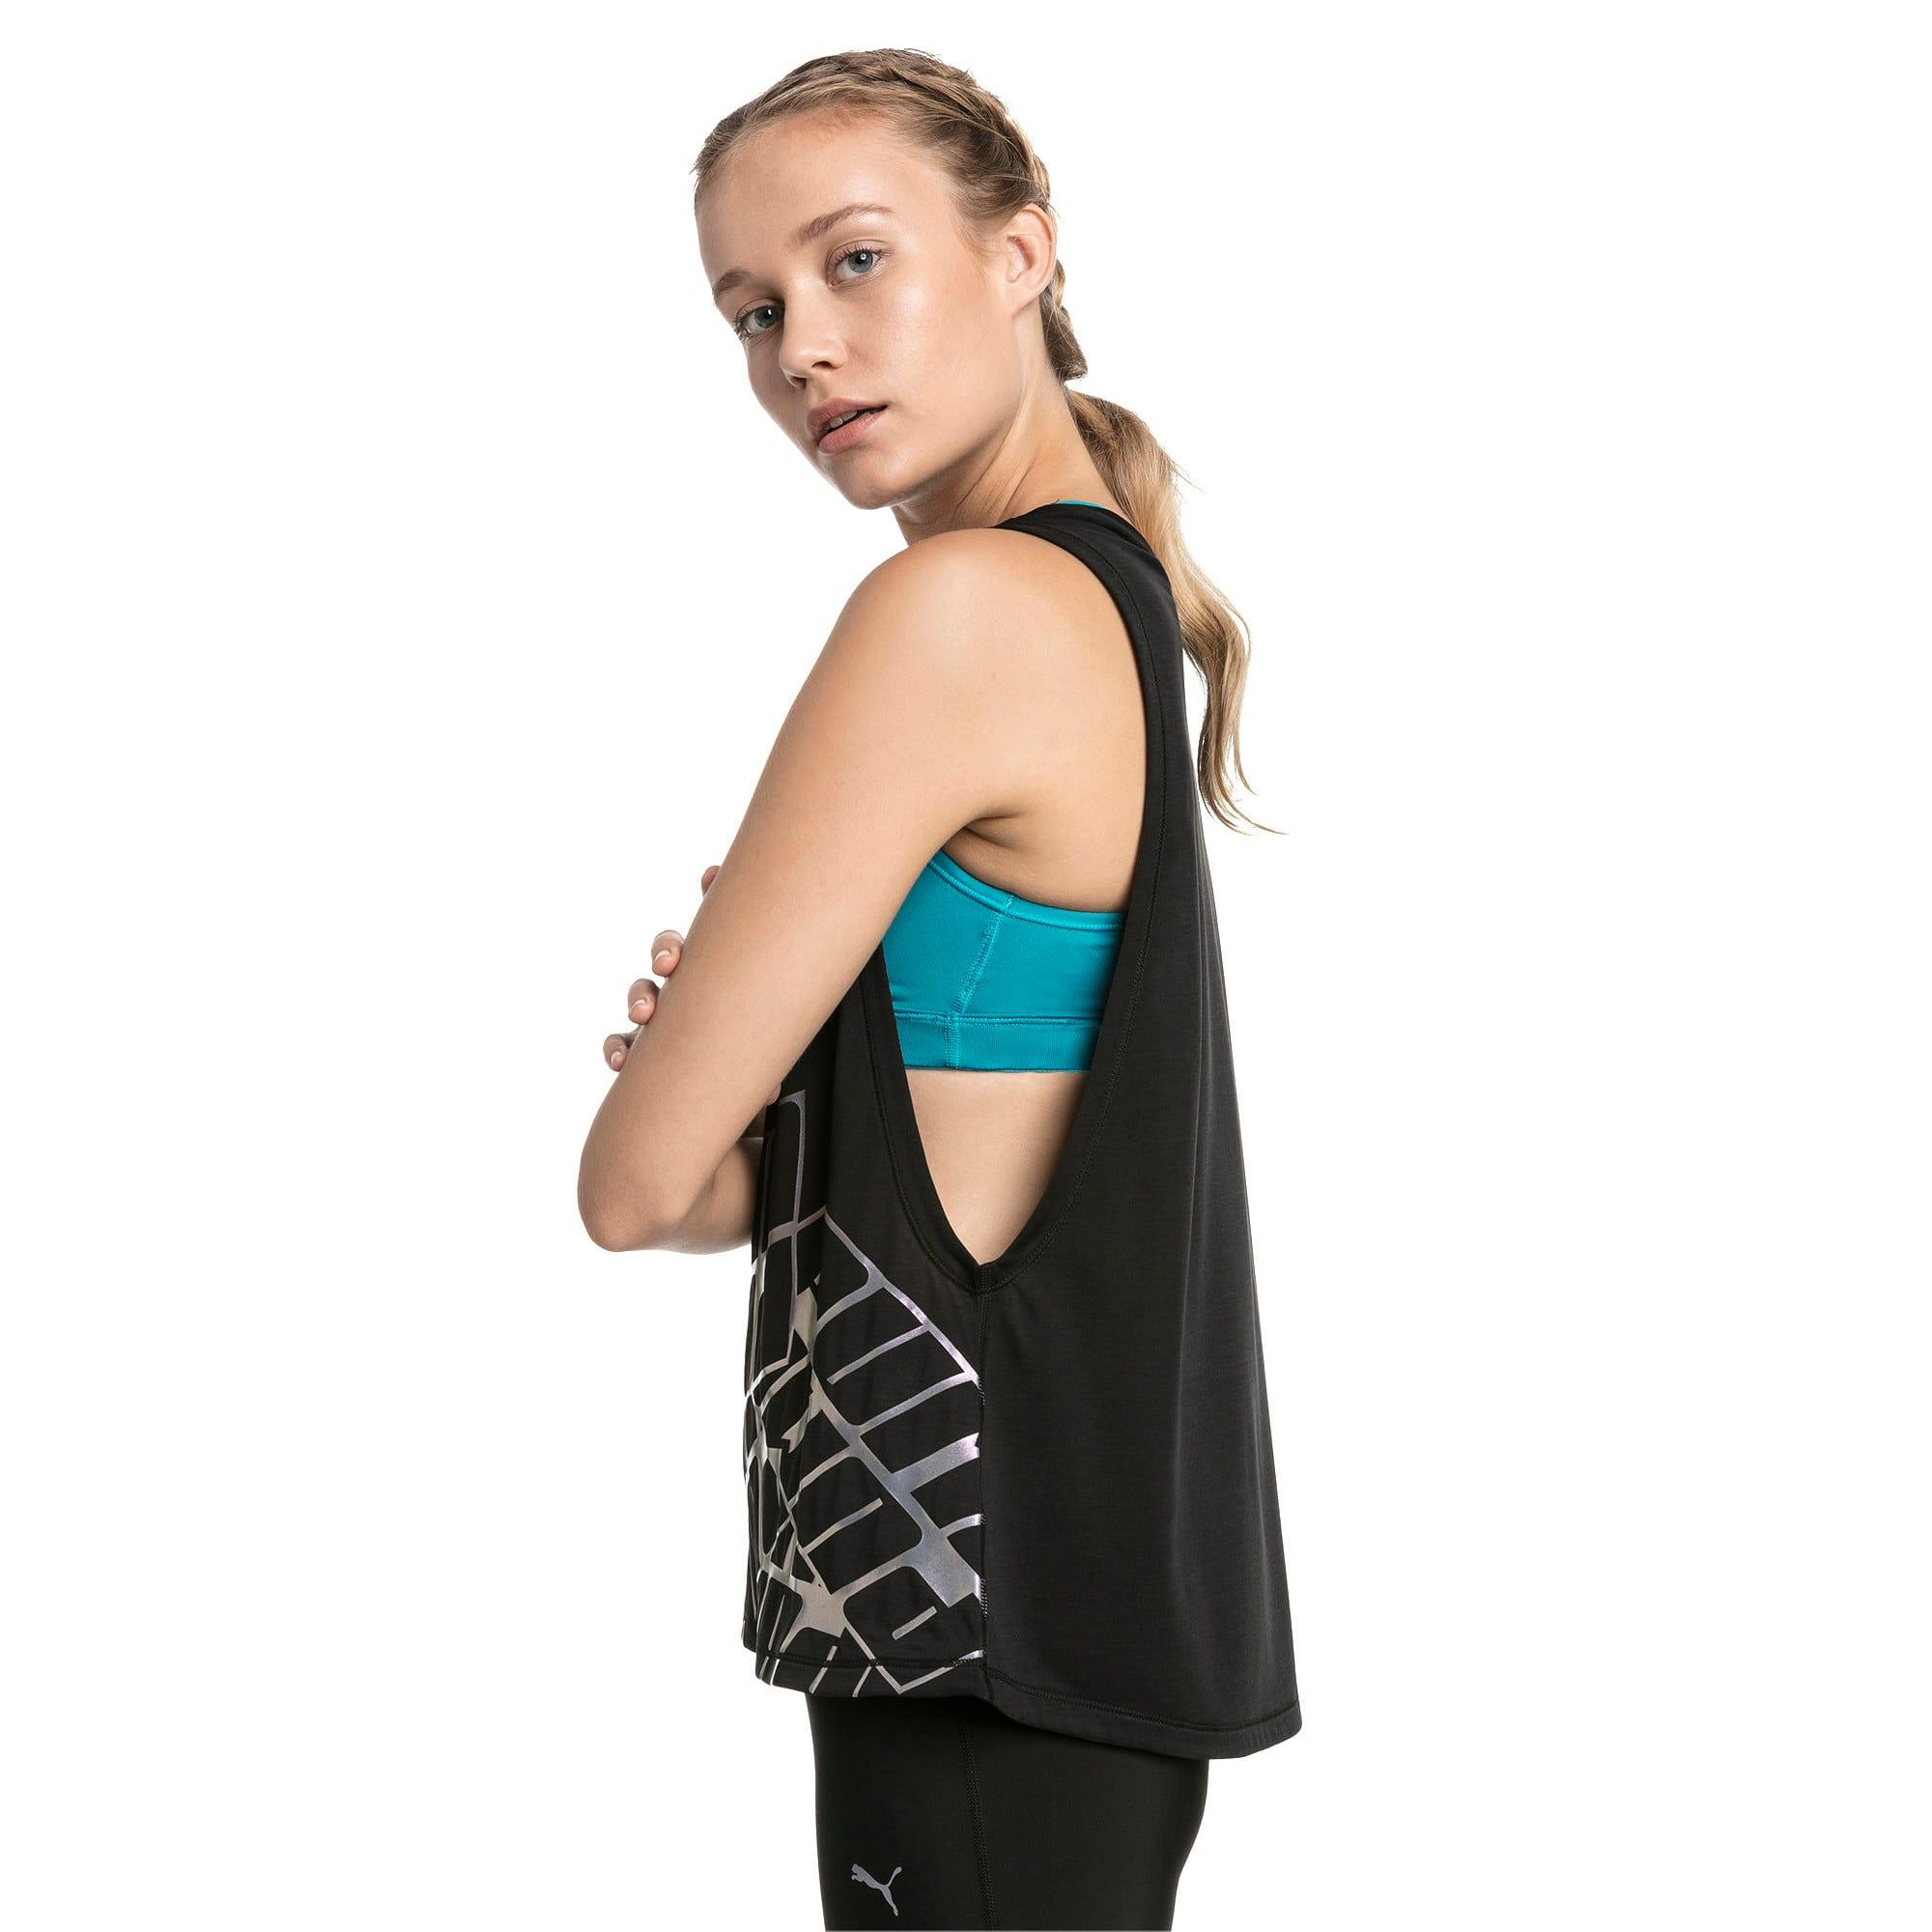 Miniatura 2 de Camiseta sin mangas Aire de mujer, Puma Black Heather, mediano